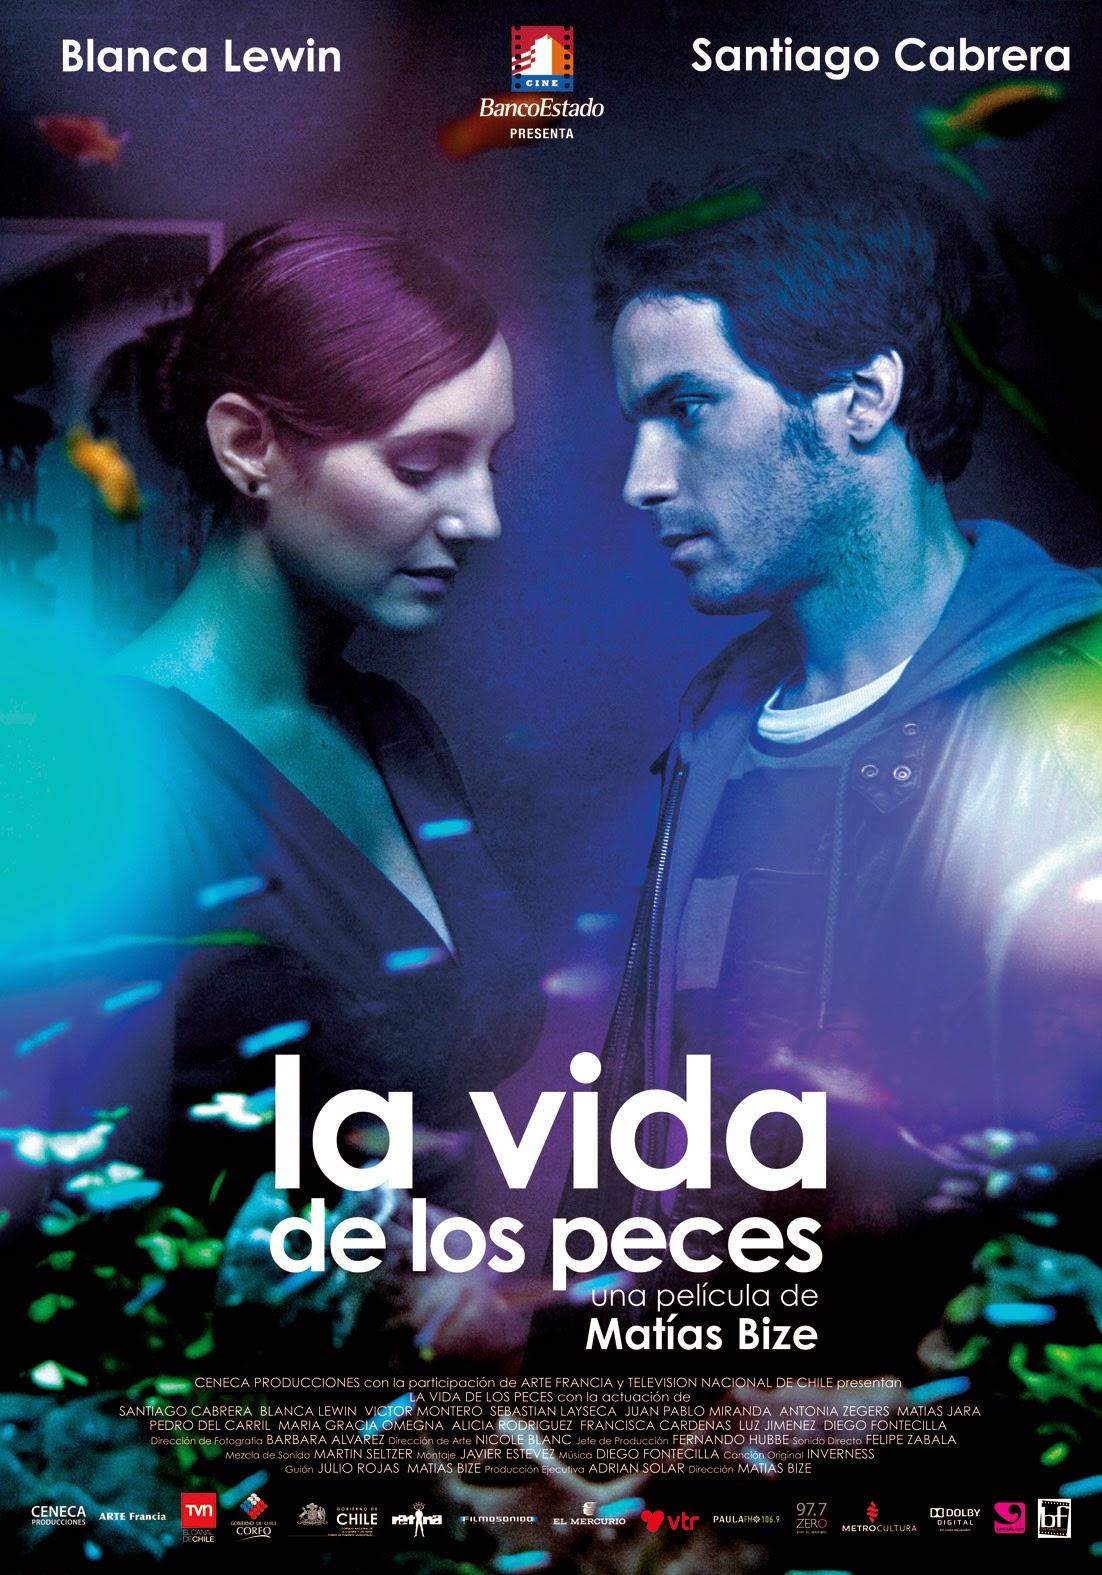 La vida de los peces (2010) ταινιες online seires oipeirates greek subs